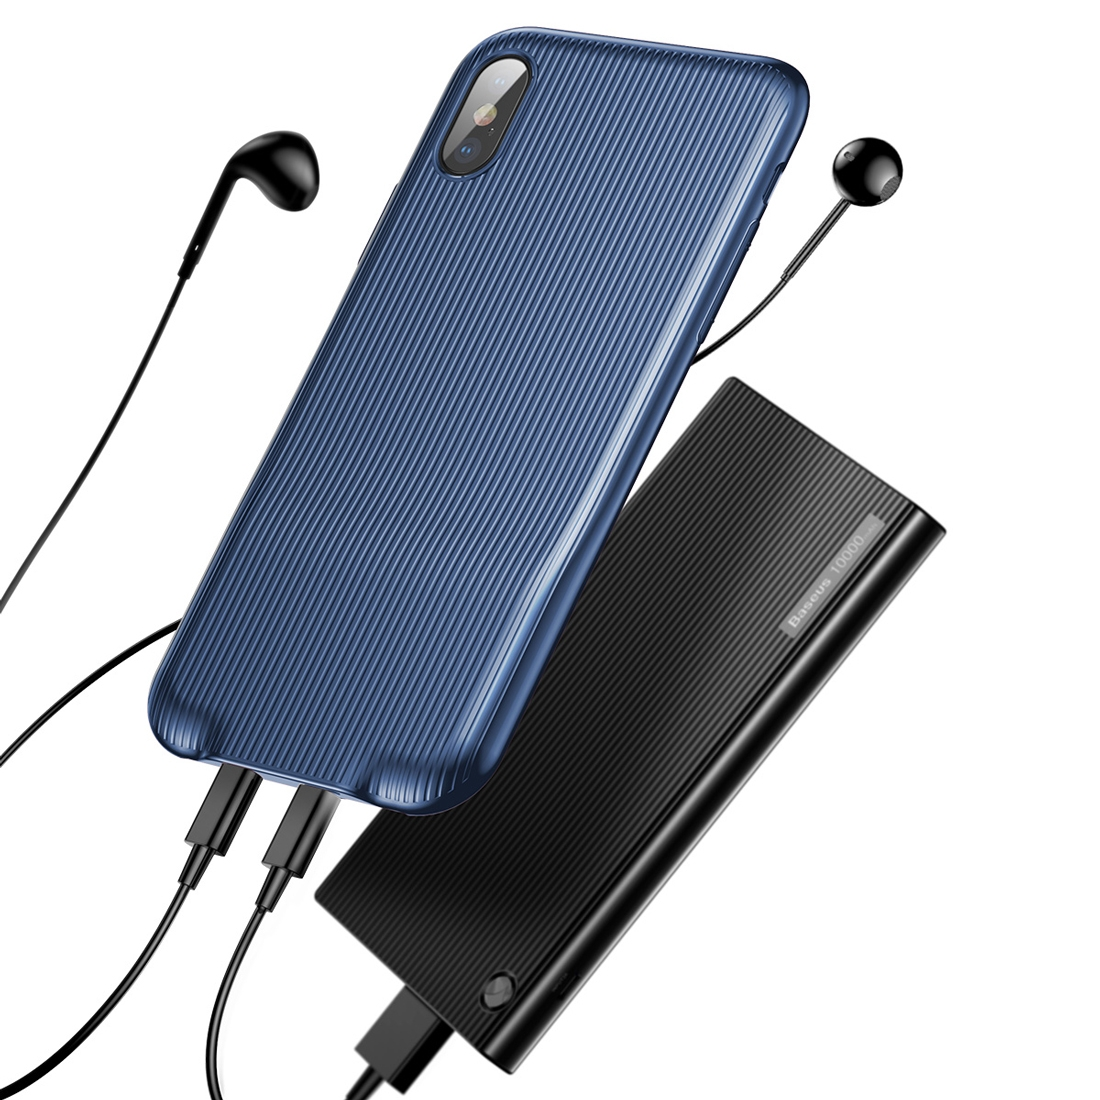 Baseus Audio Case till iPhone X/Xs Skal Dubbla Lightning Kontakter Blå